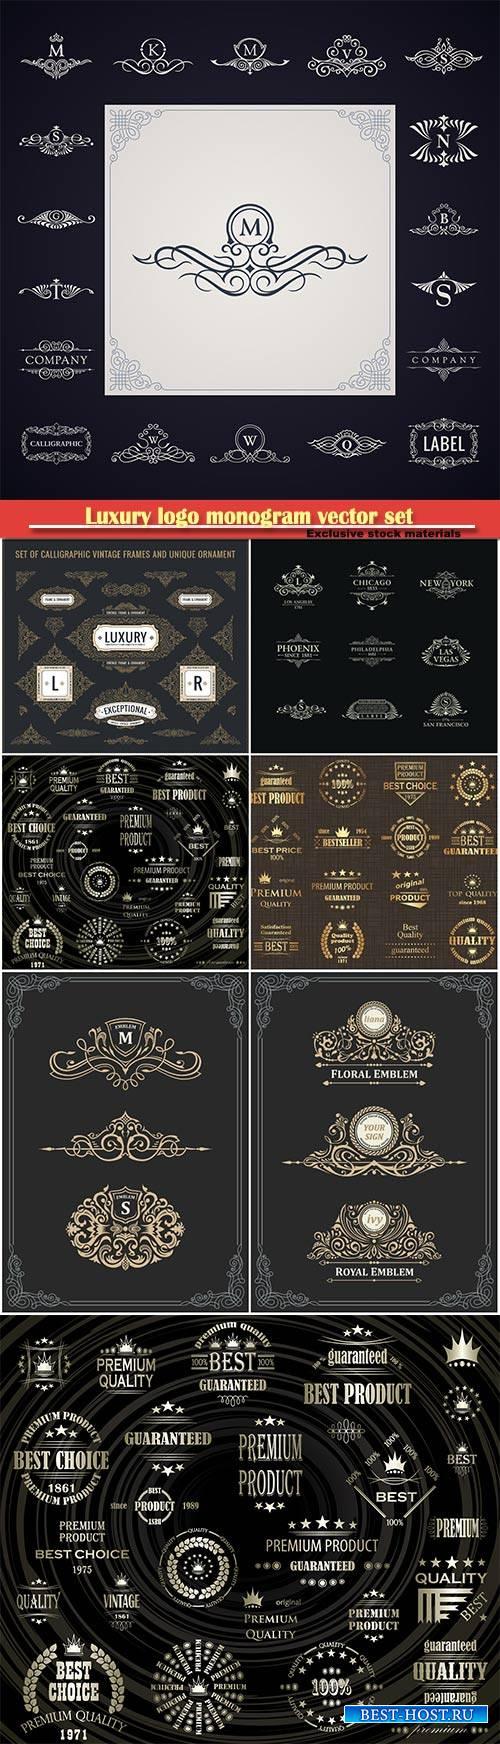 Luxury logo monogram vector set, calligraphic design elements